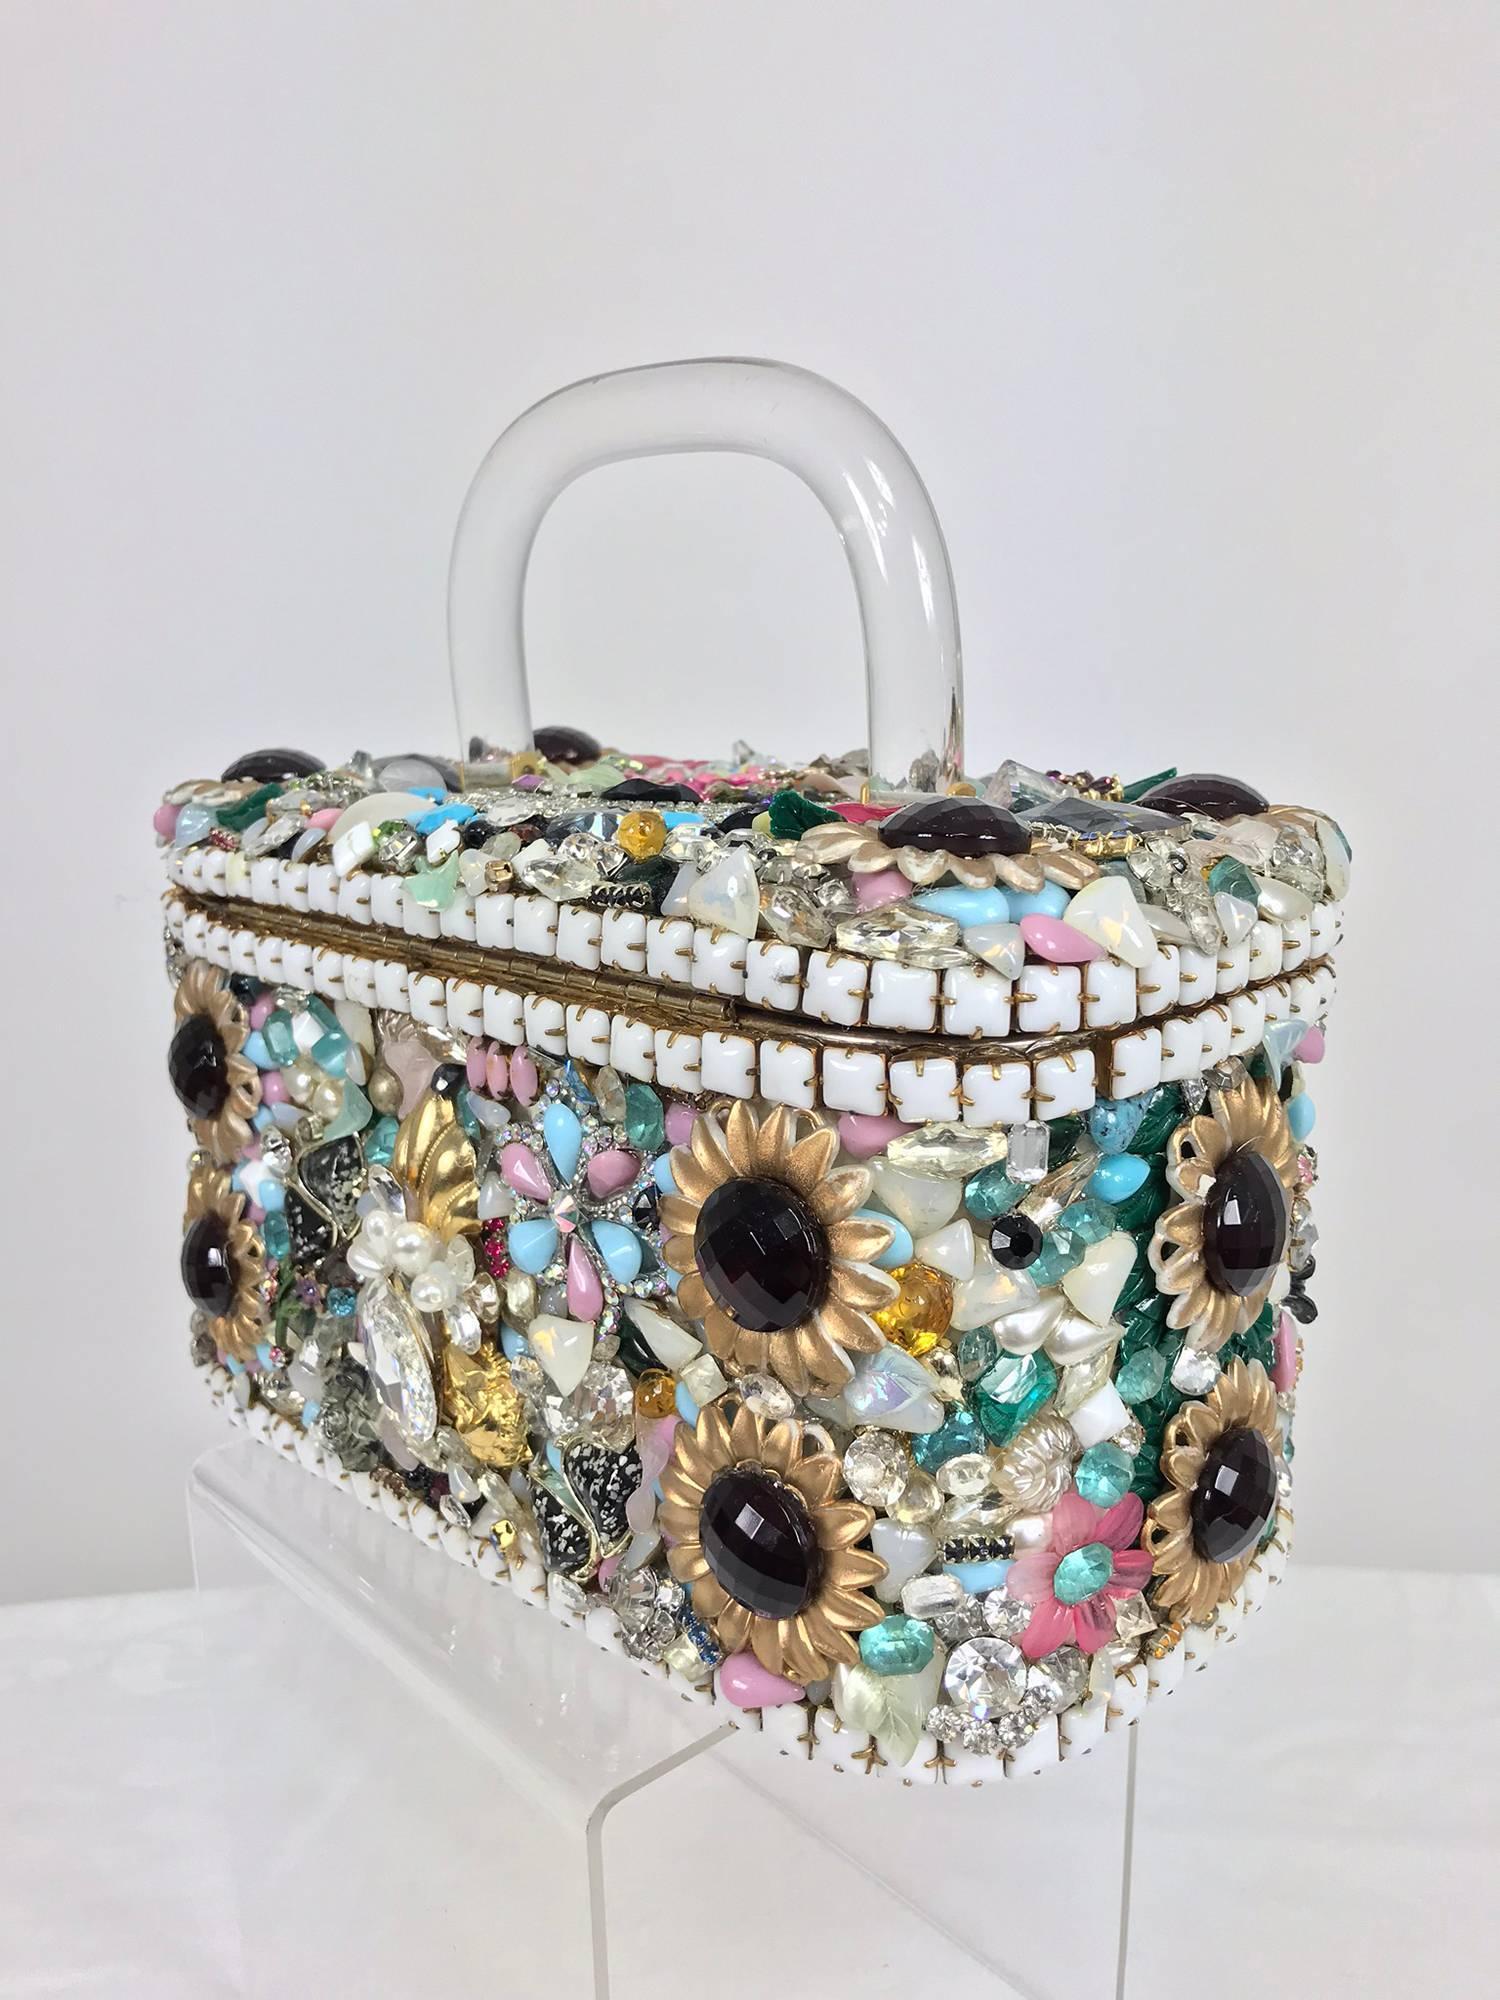 1stdibs Custom Made Jewel Encrusted Lucite Handle Hand Bag 1980s pZu33PsO